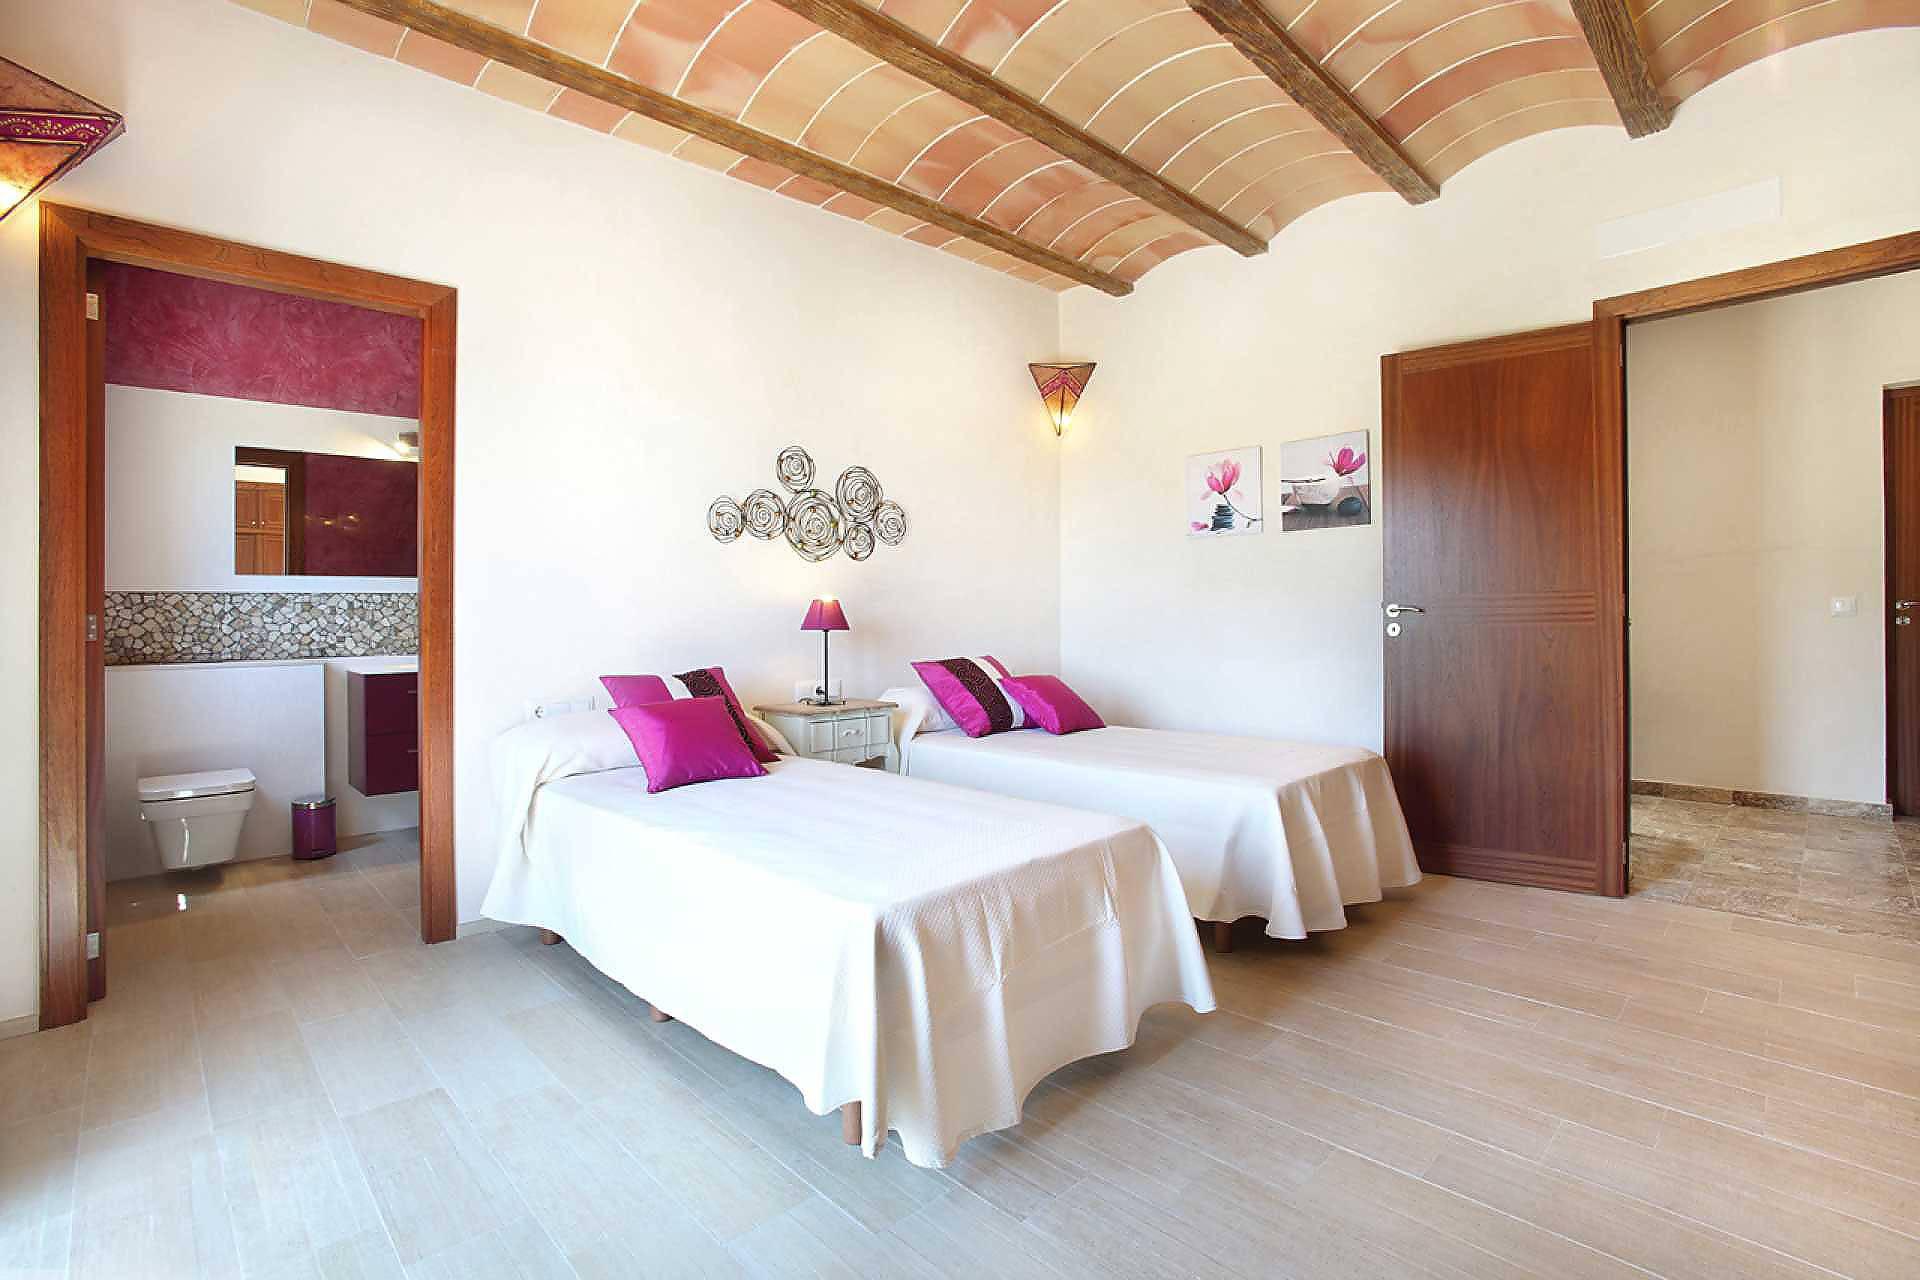 01-45 Exclusive Finca Mallorca East Bild 41